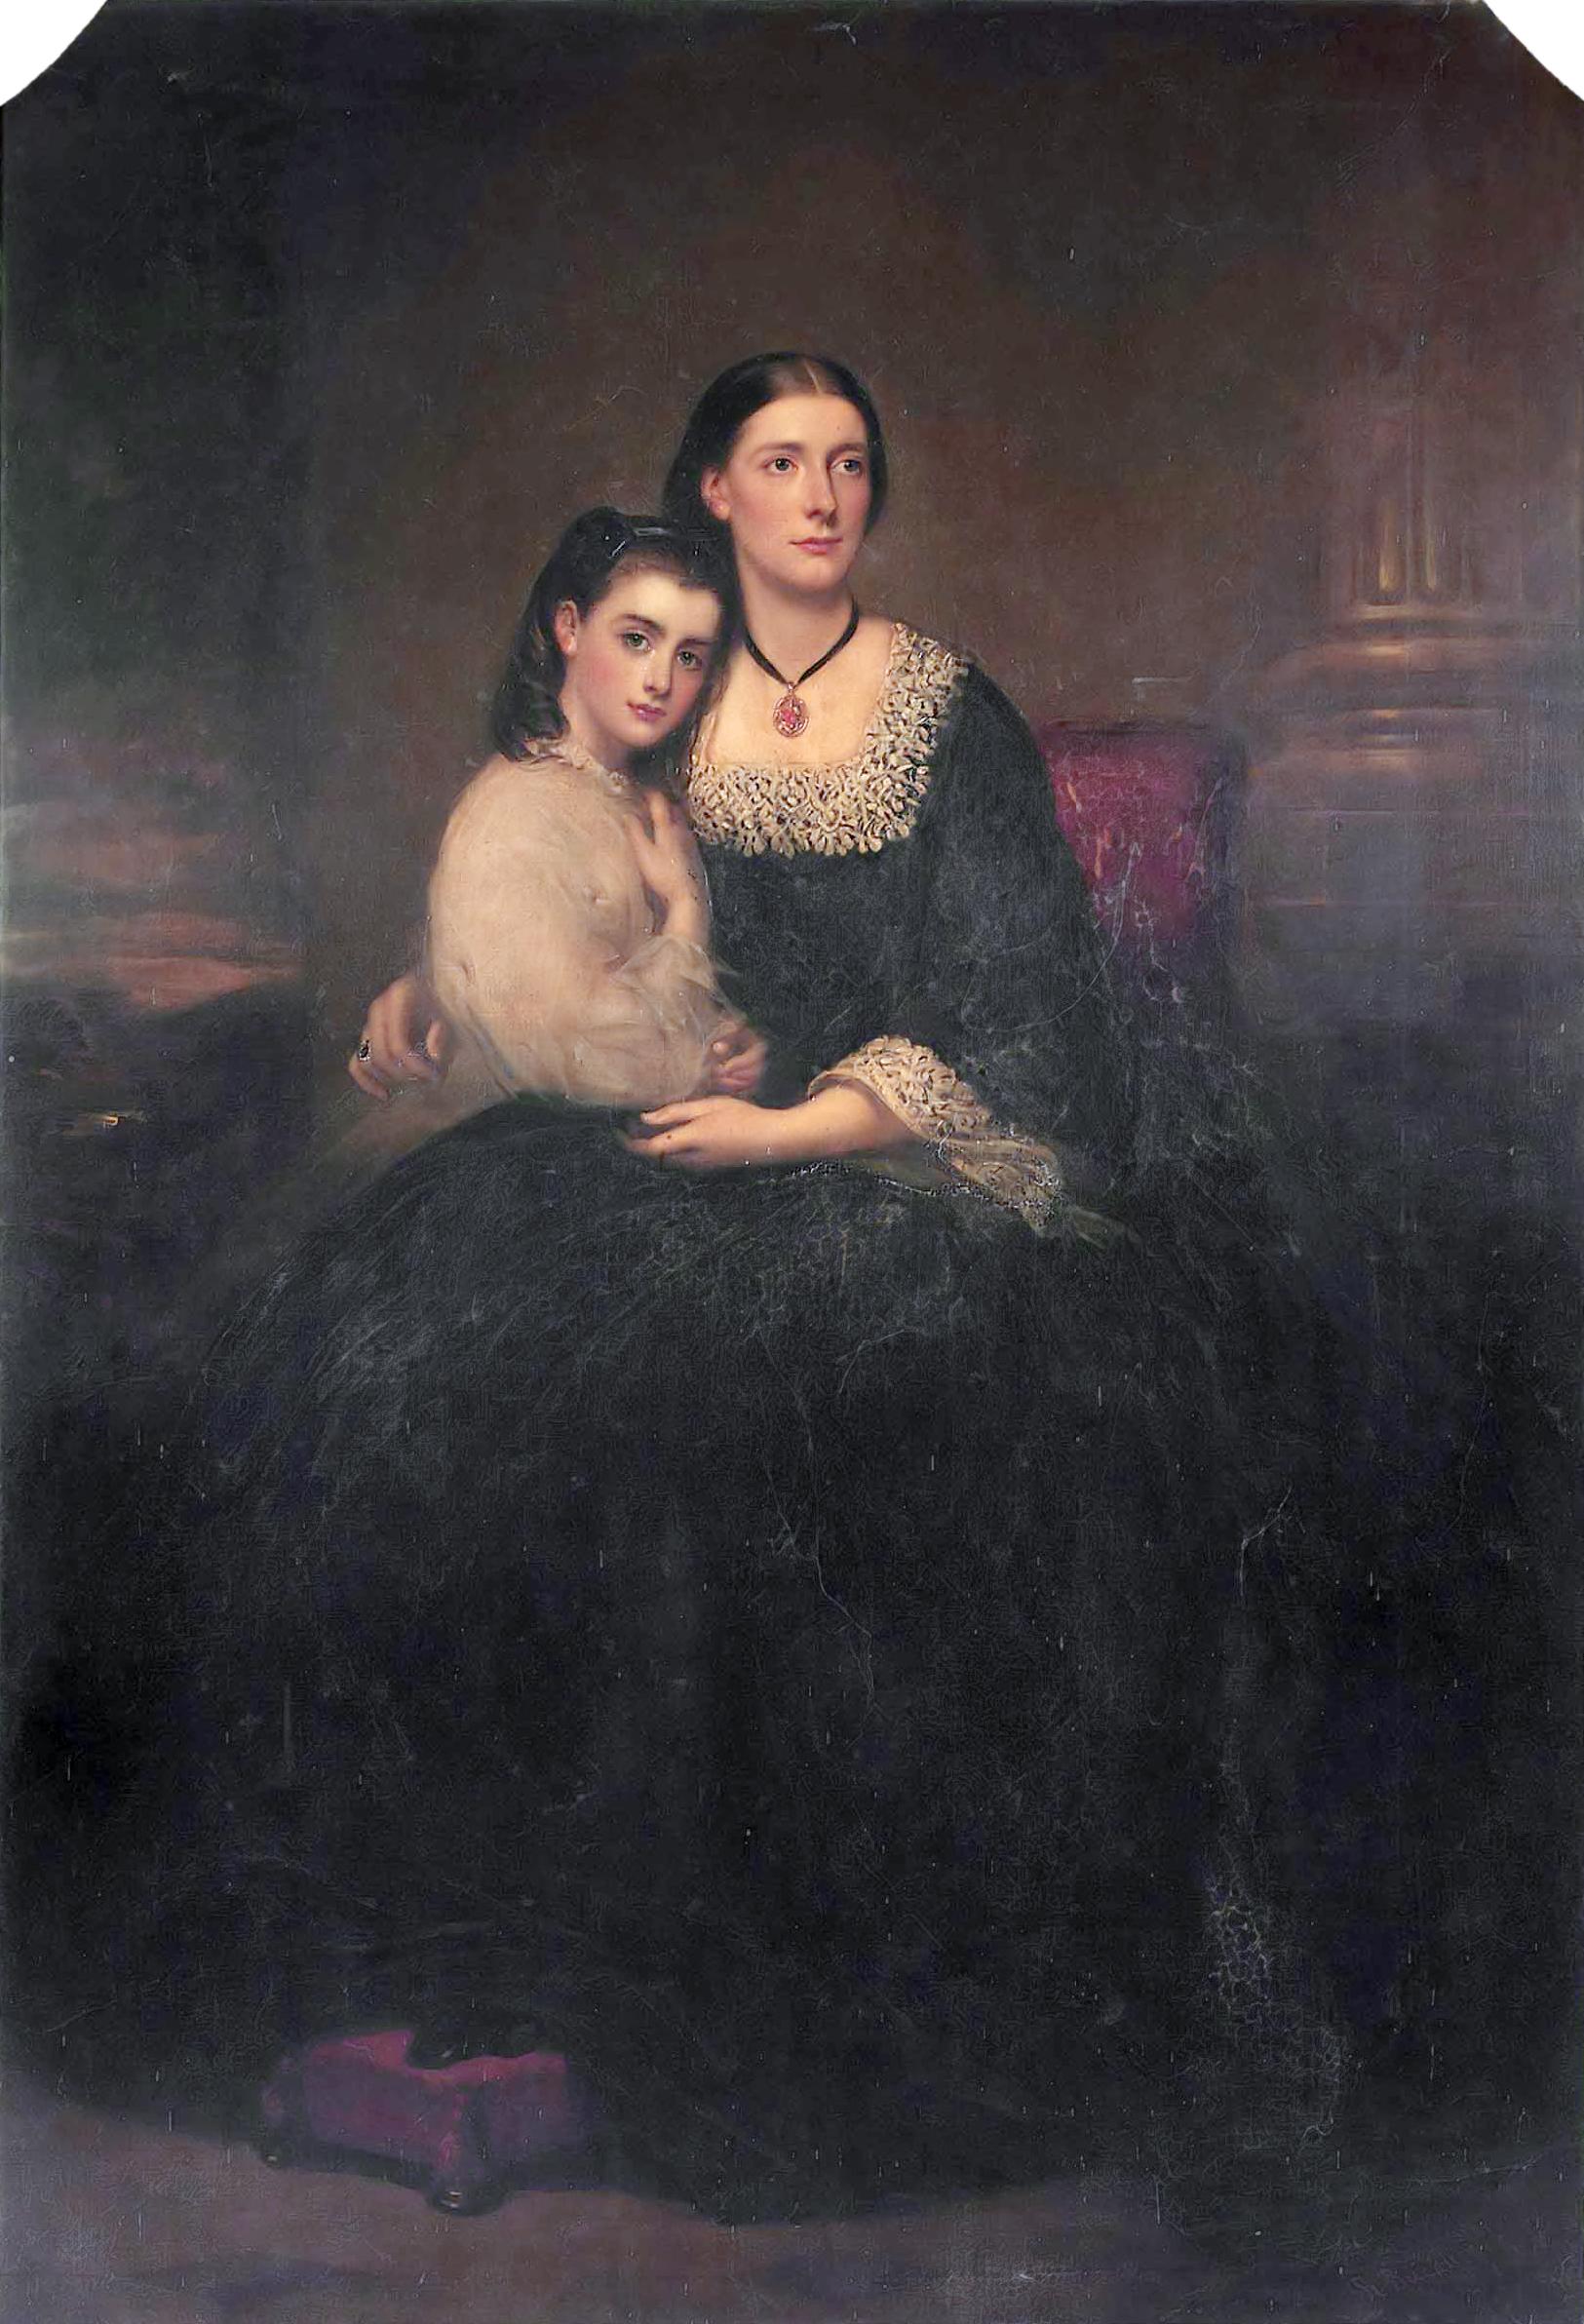 Richard Buckner, Emily, 1st Viscountess Hambleden, and her Daughter